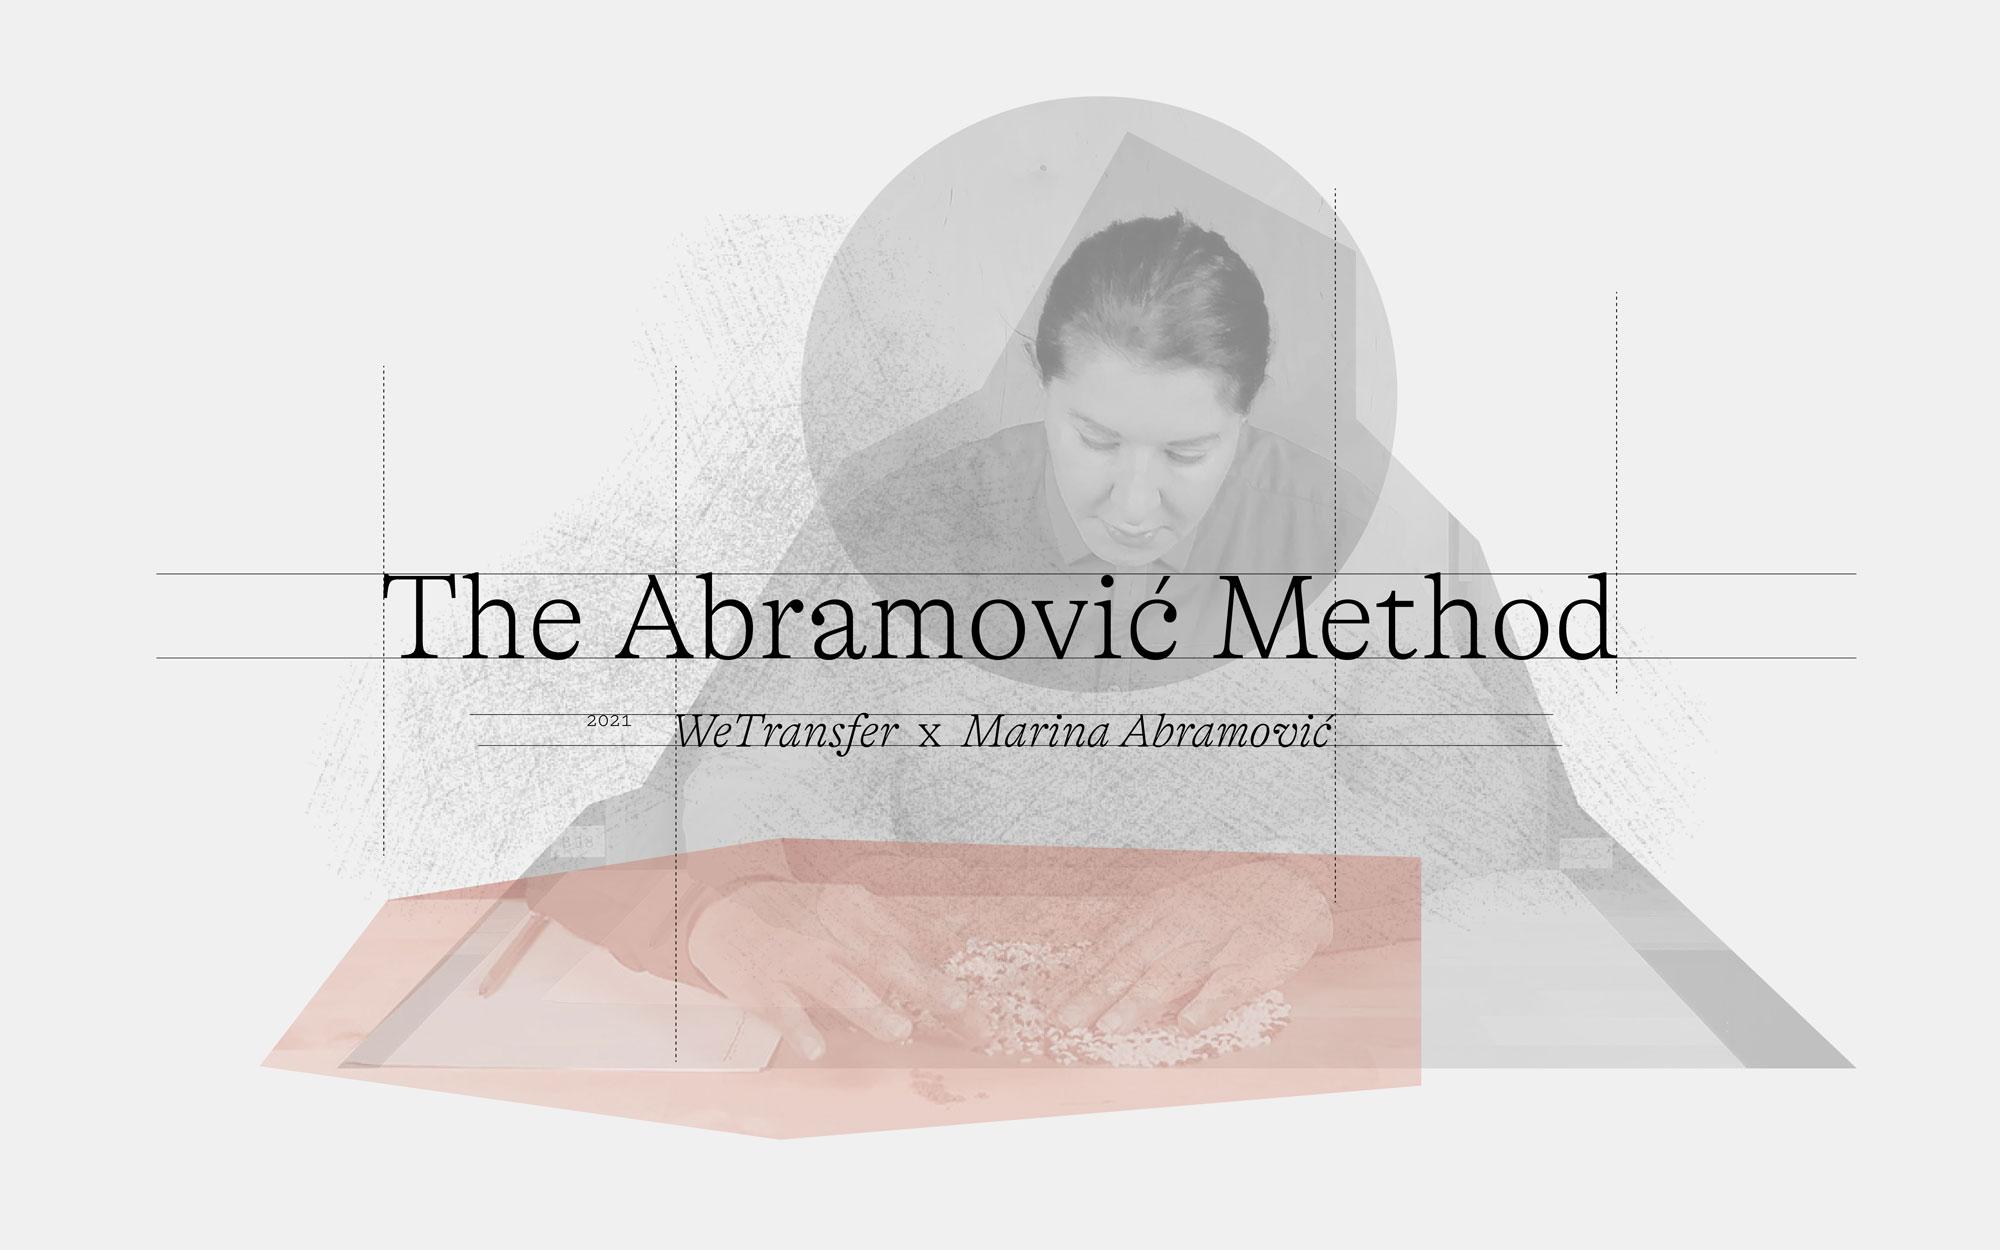 The-Abramovic-Method-by-WeTransfer-and-Marina-Abramovic,-2021.jpg